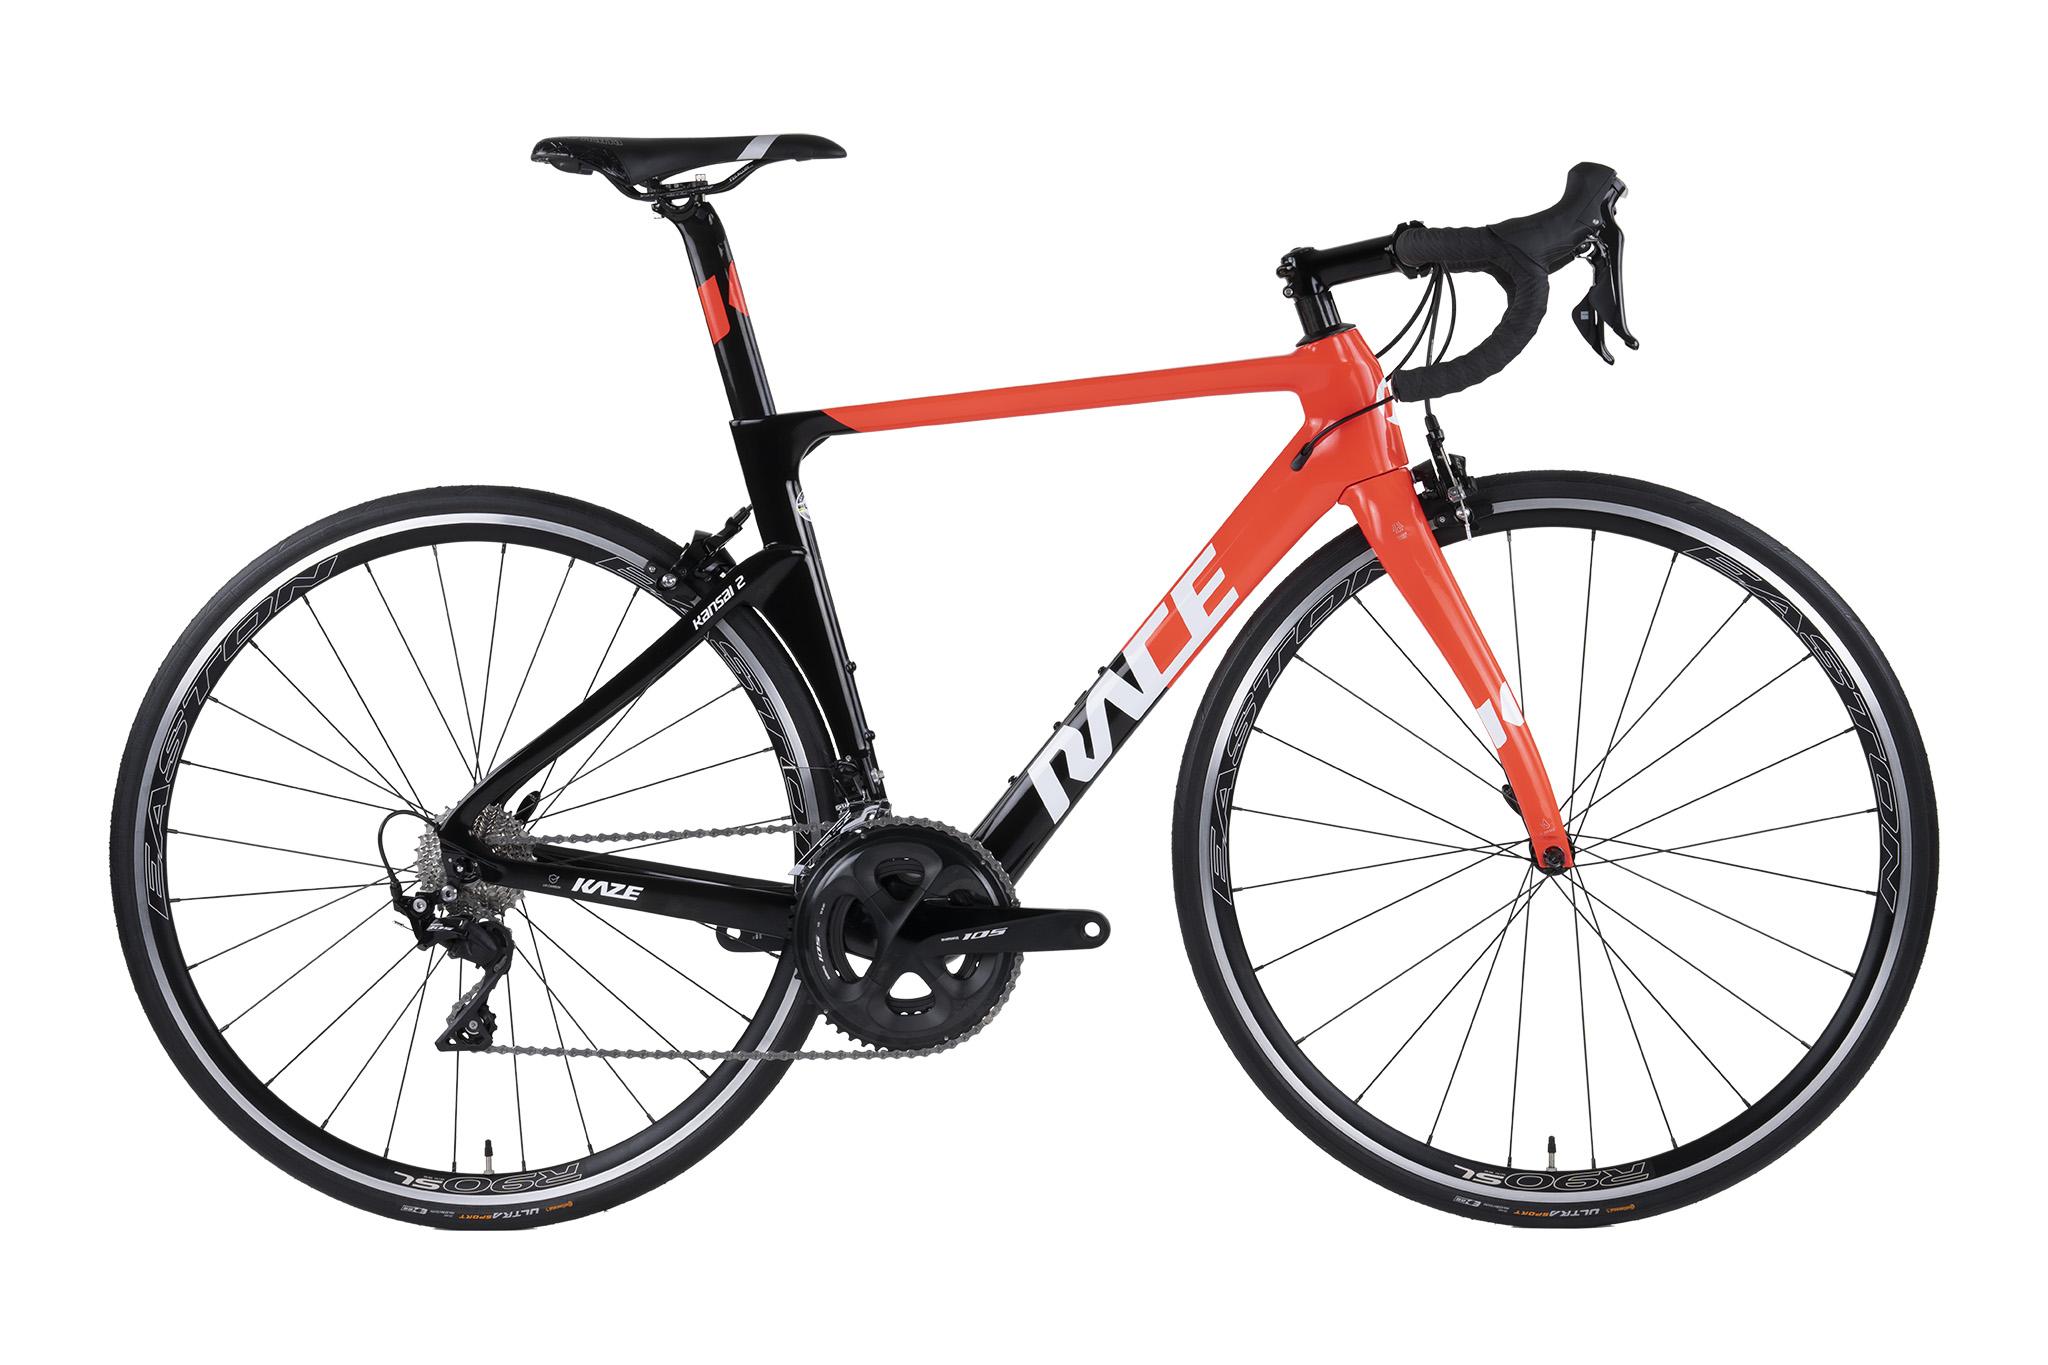 KAZE RACE | 2022  KANSAI2  Caliper Brake SMT